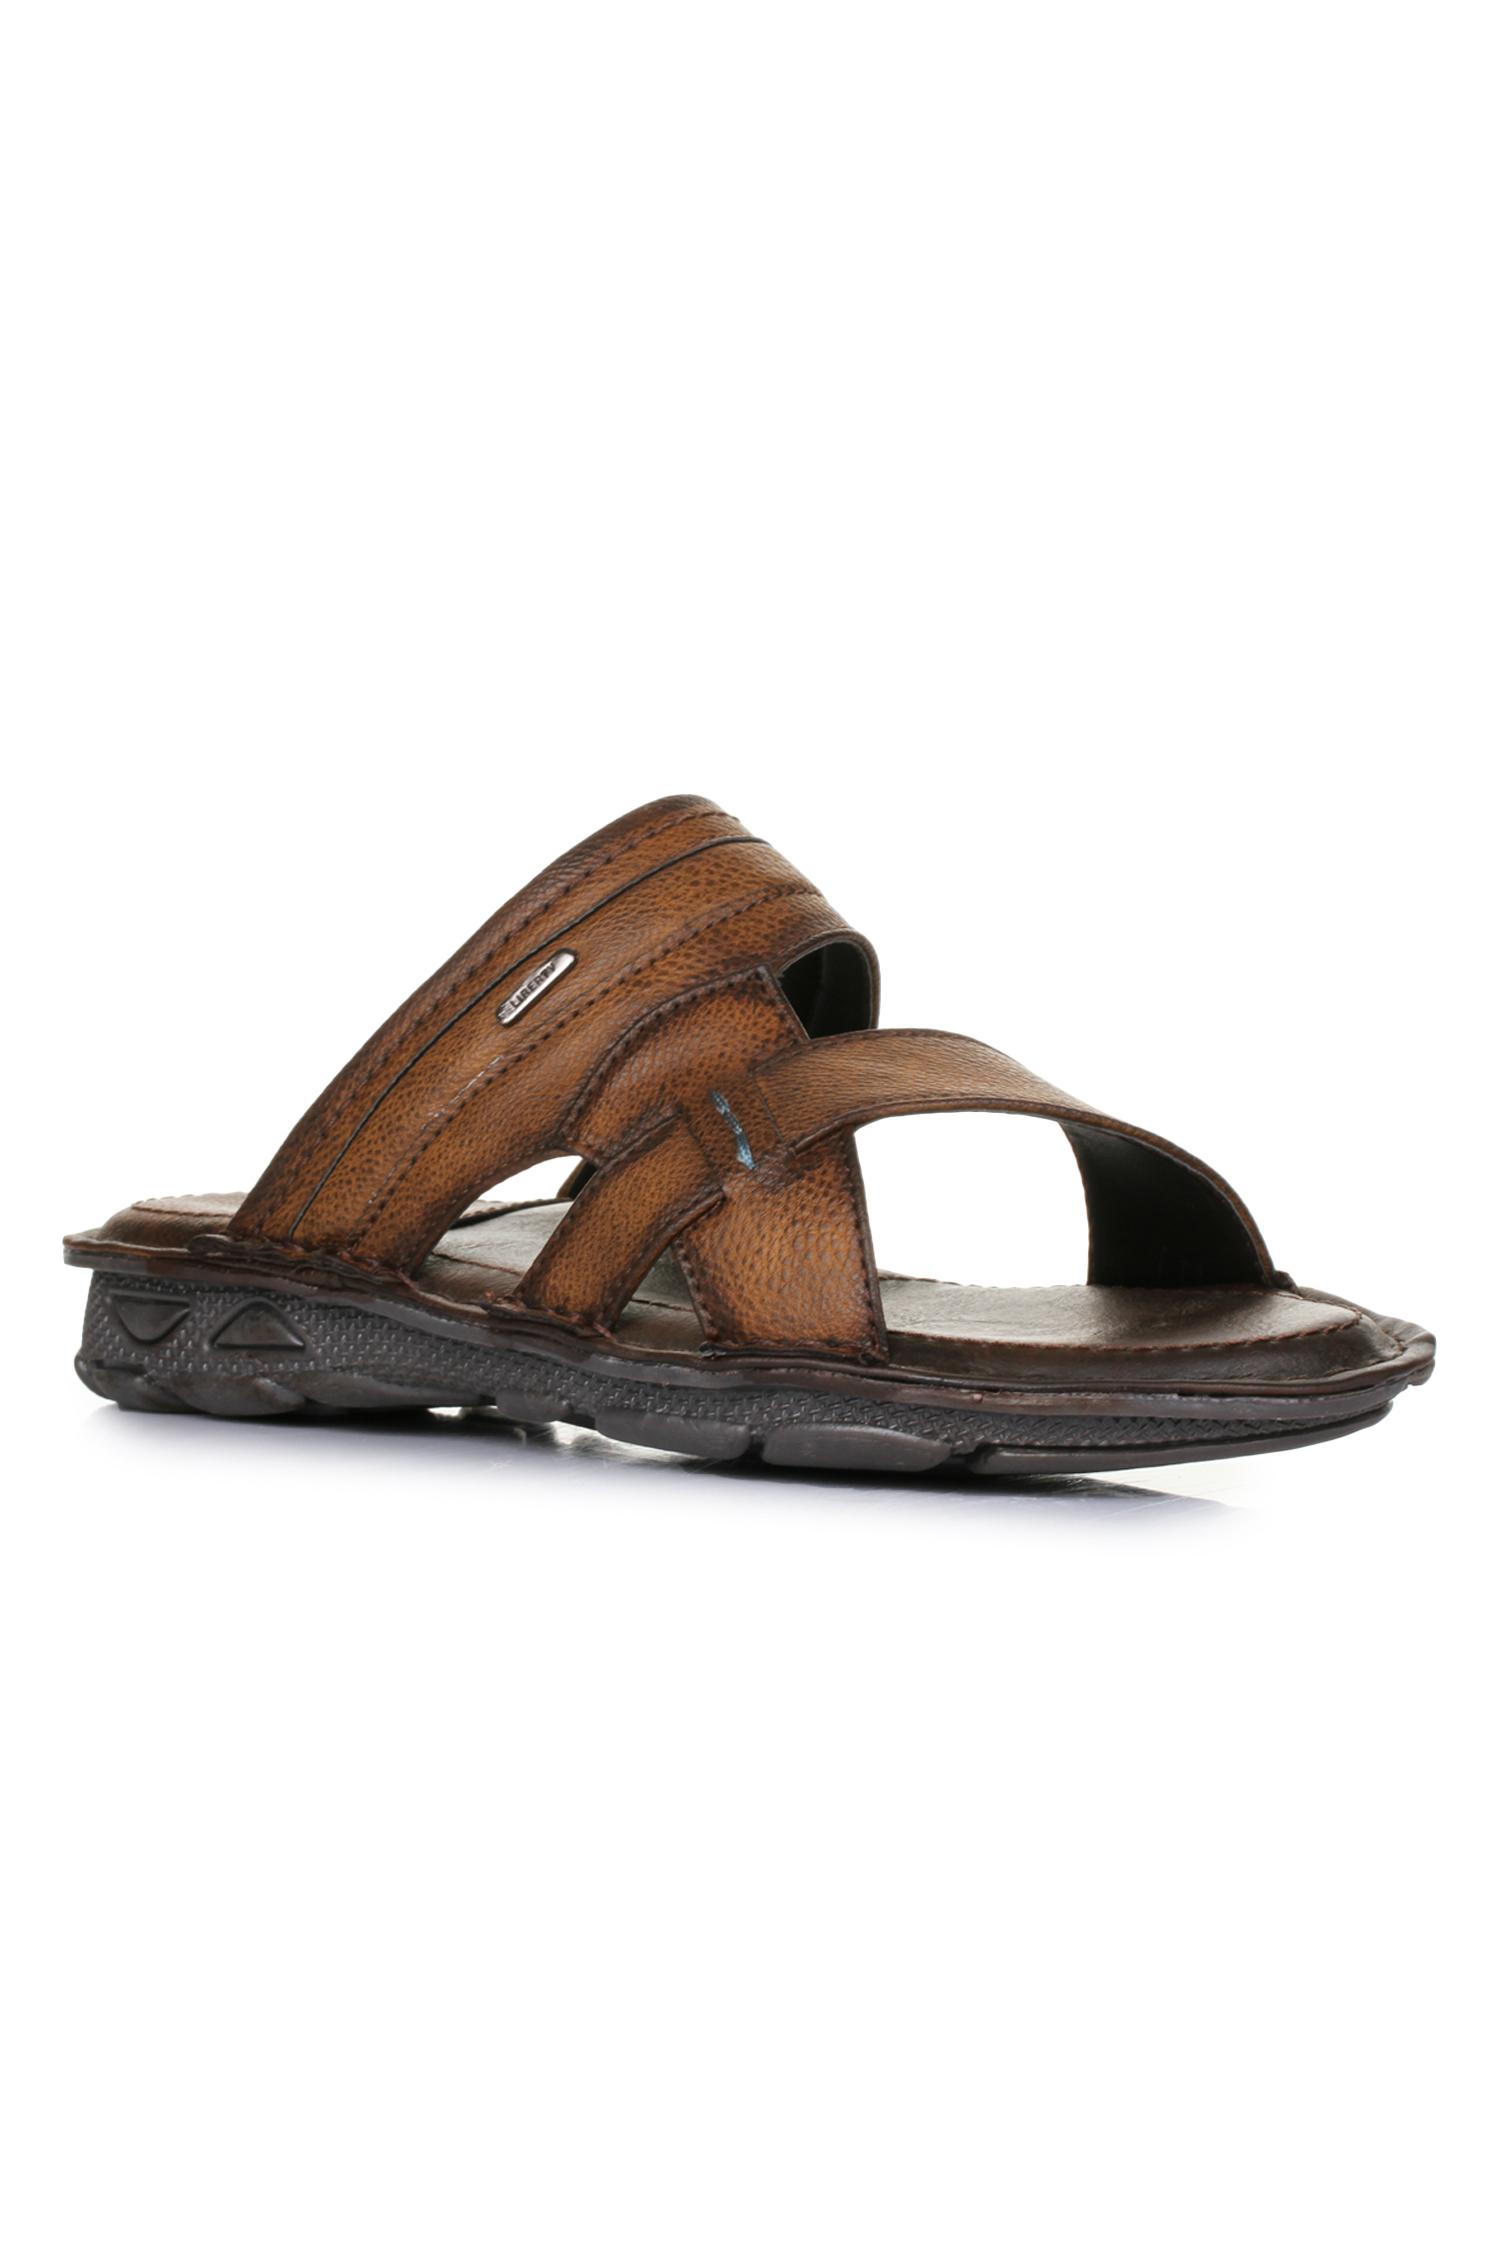 Liberty | Liberty Coolers Brown Casual Slippers LPC-4_Brown For - Men